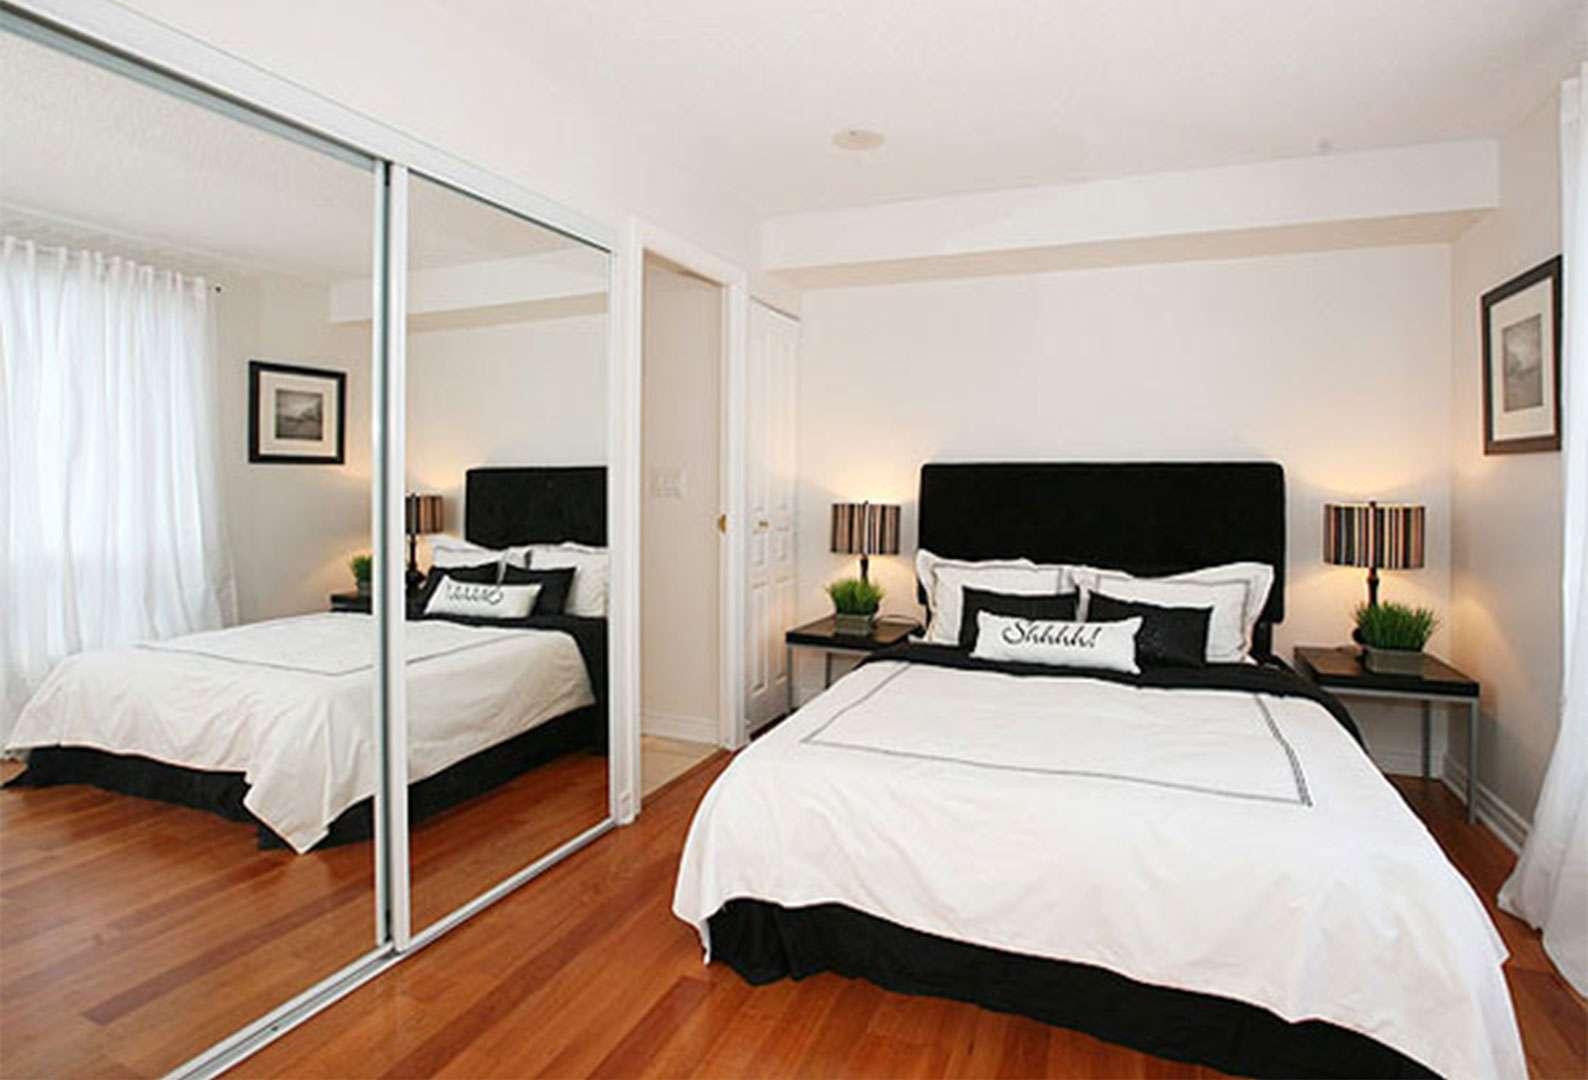 Дизайн спальни без окон